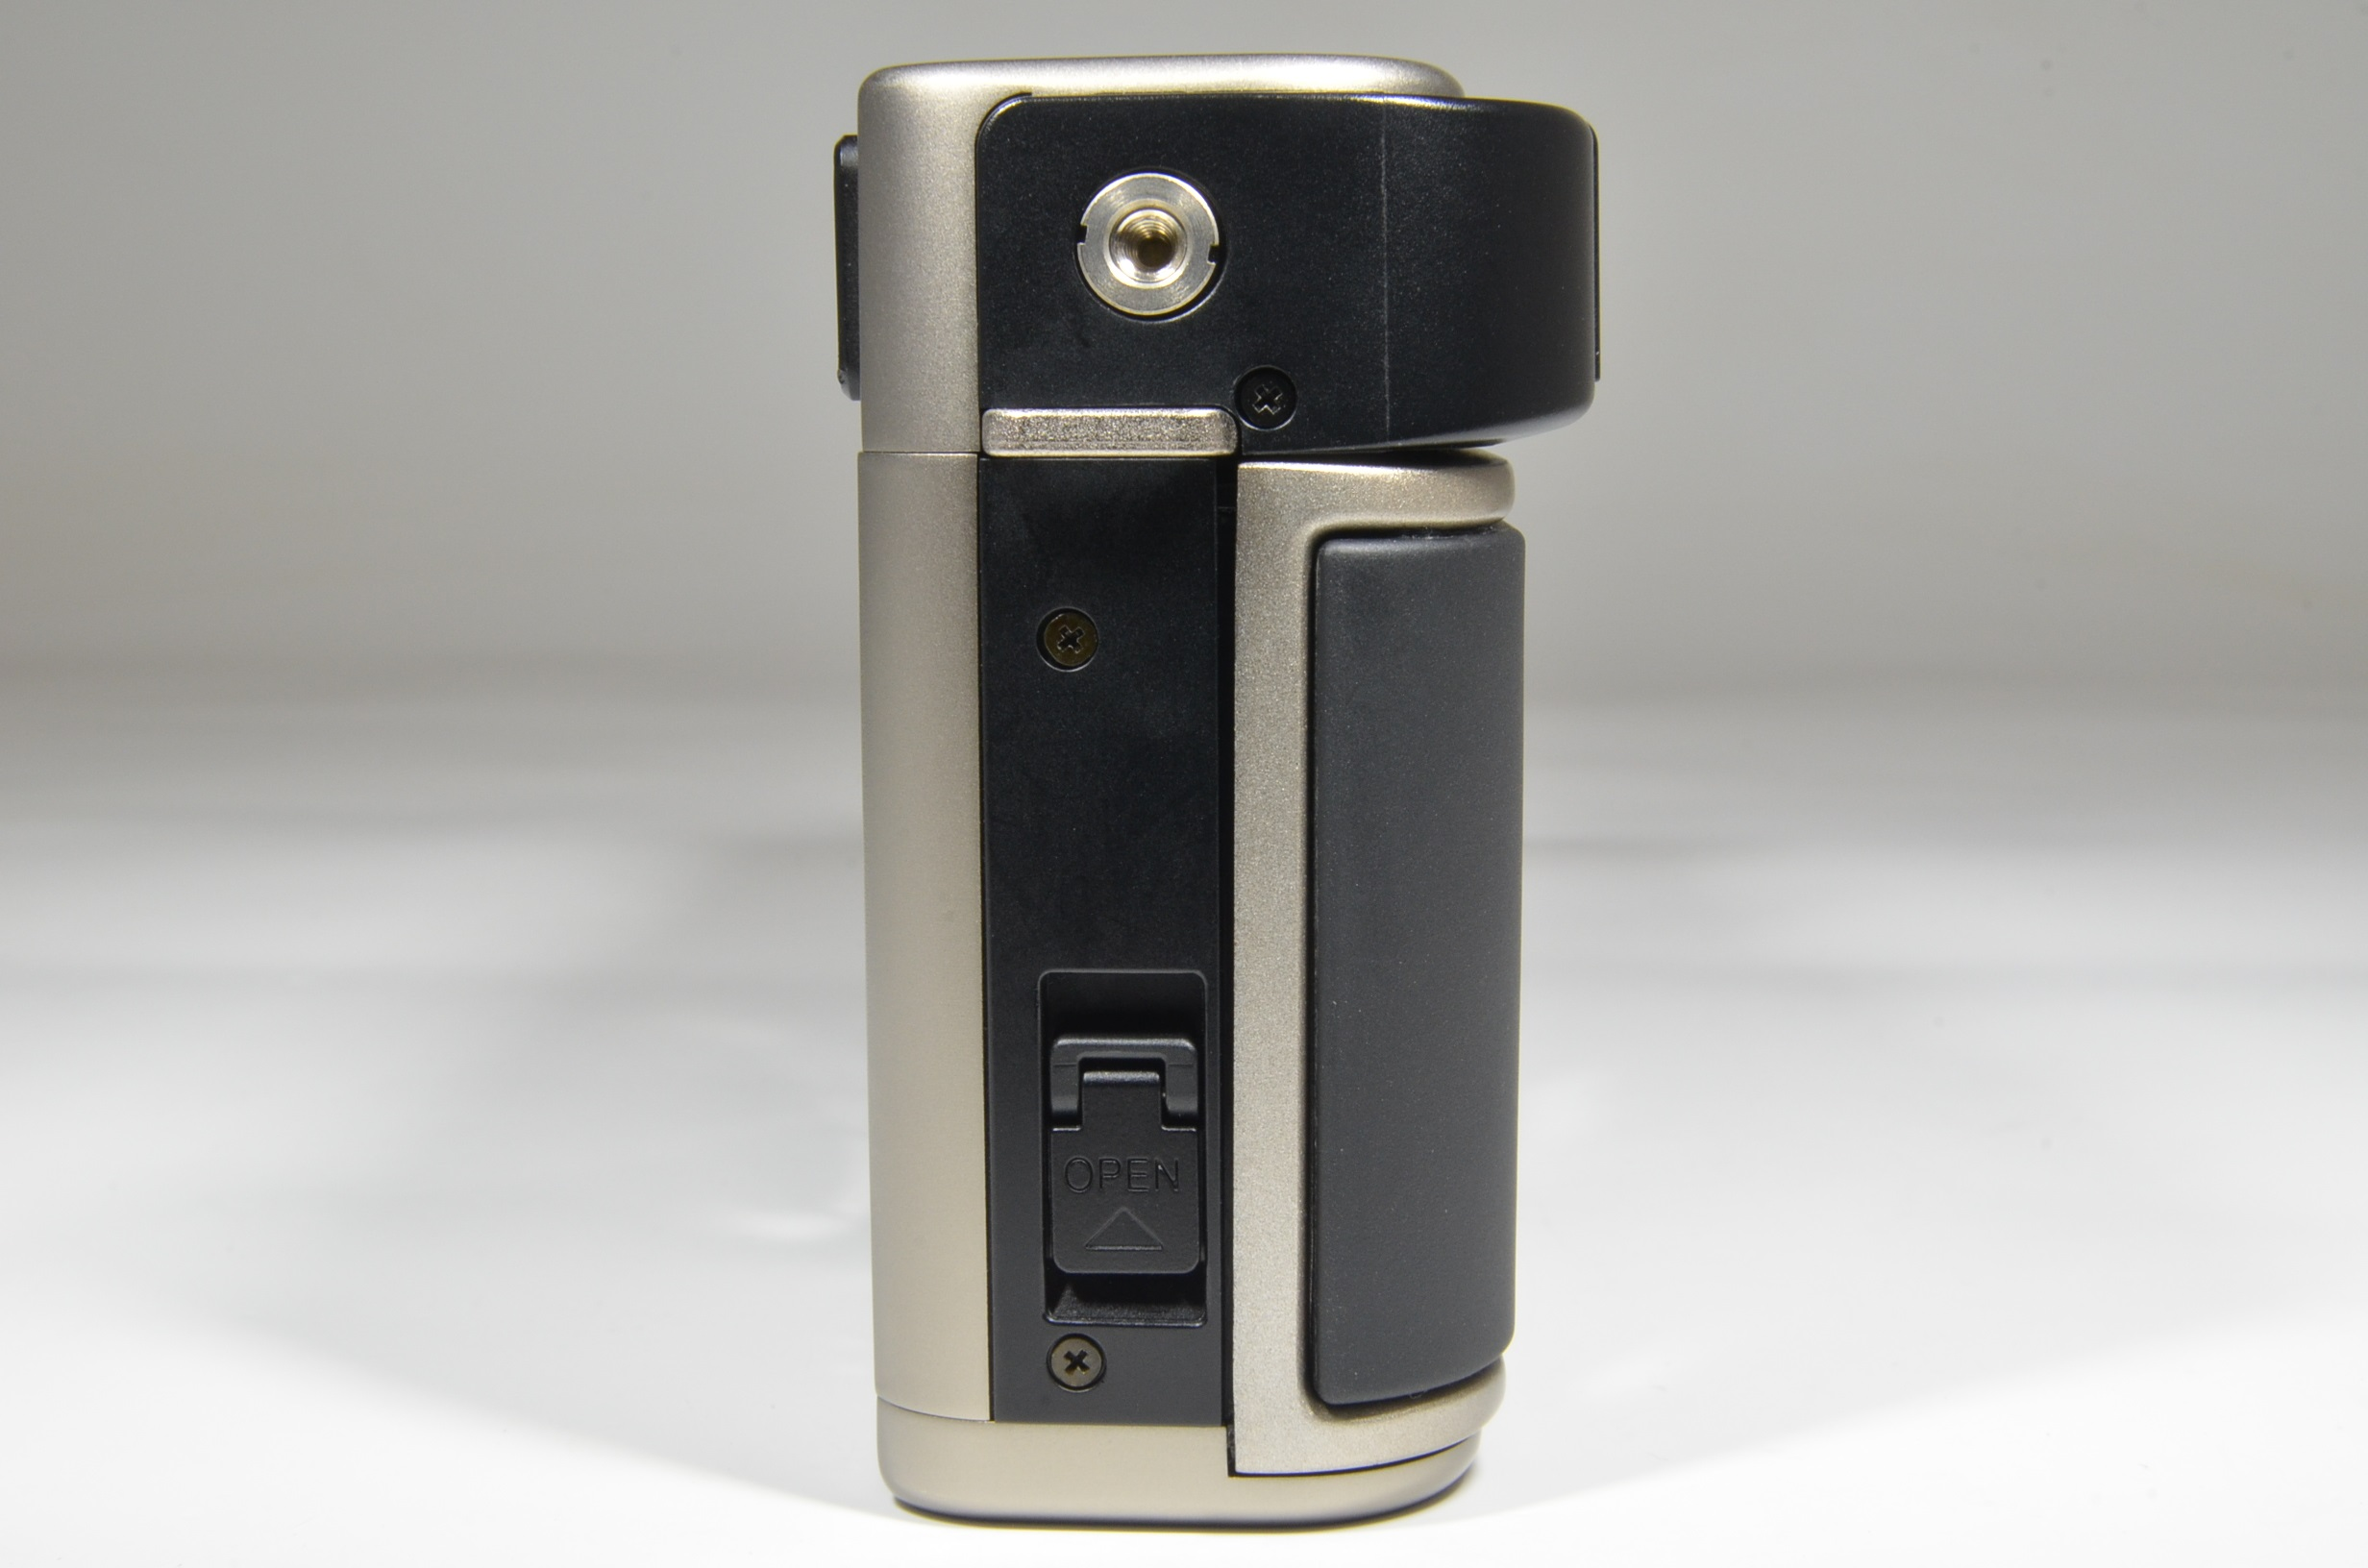 fujifilm tx-1 35mm film camera with fujinon super-ebc 45mm f4